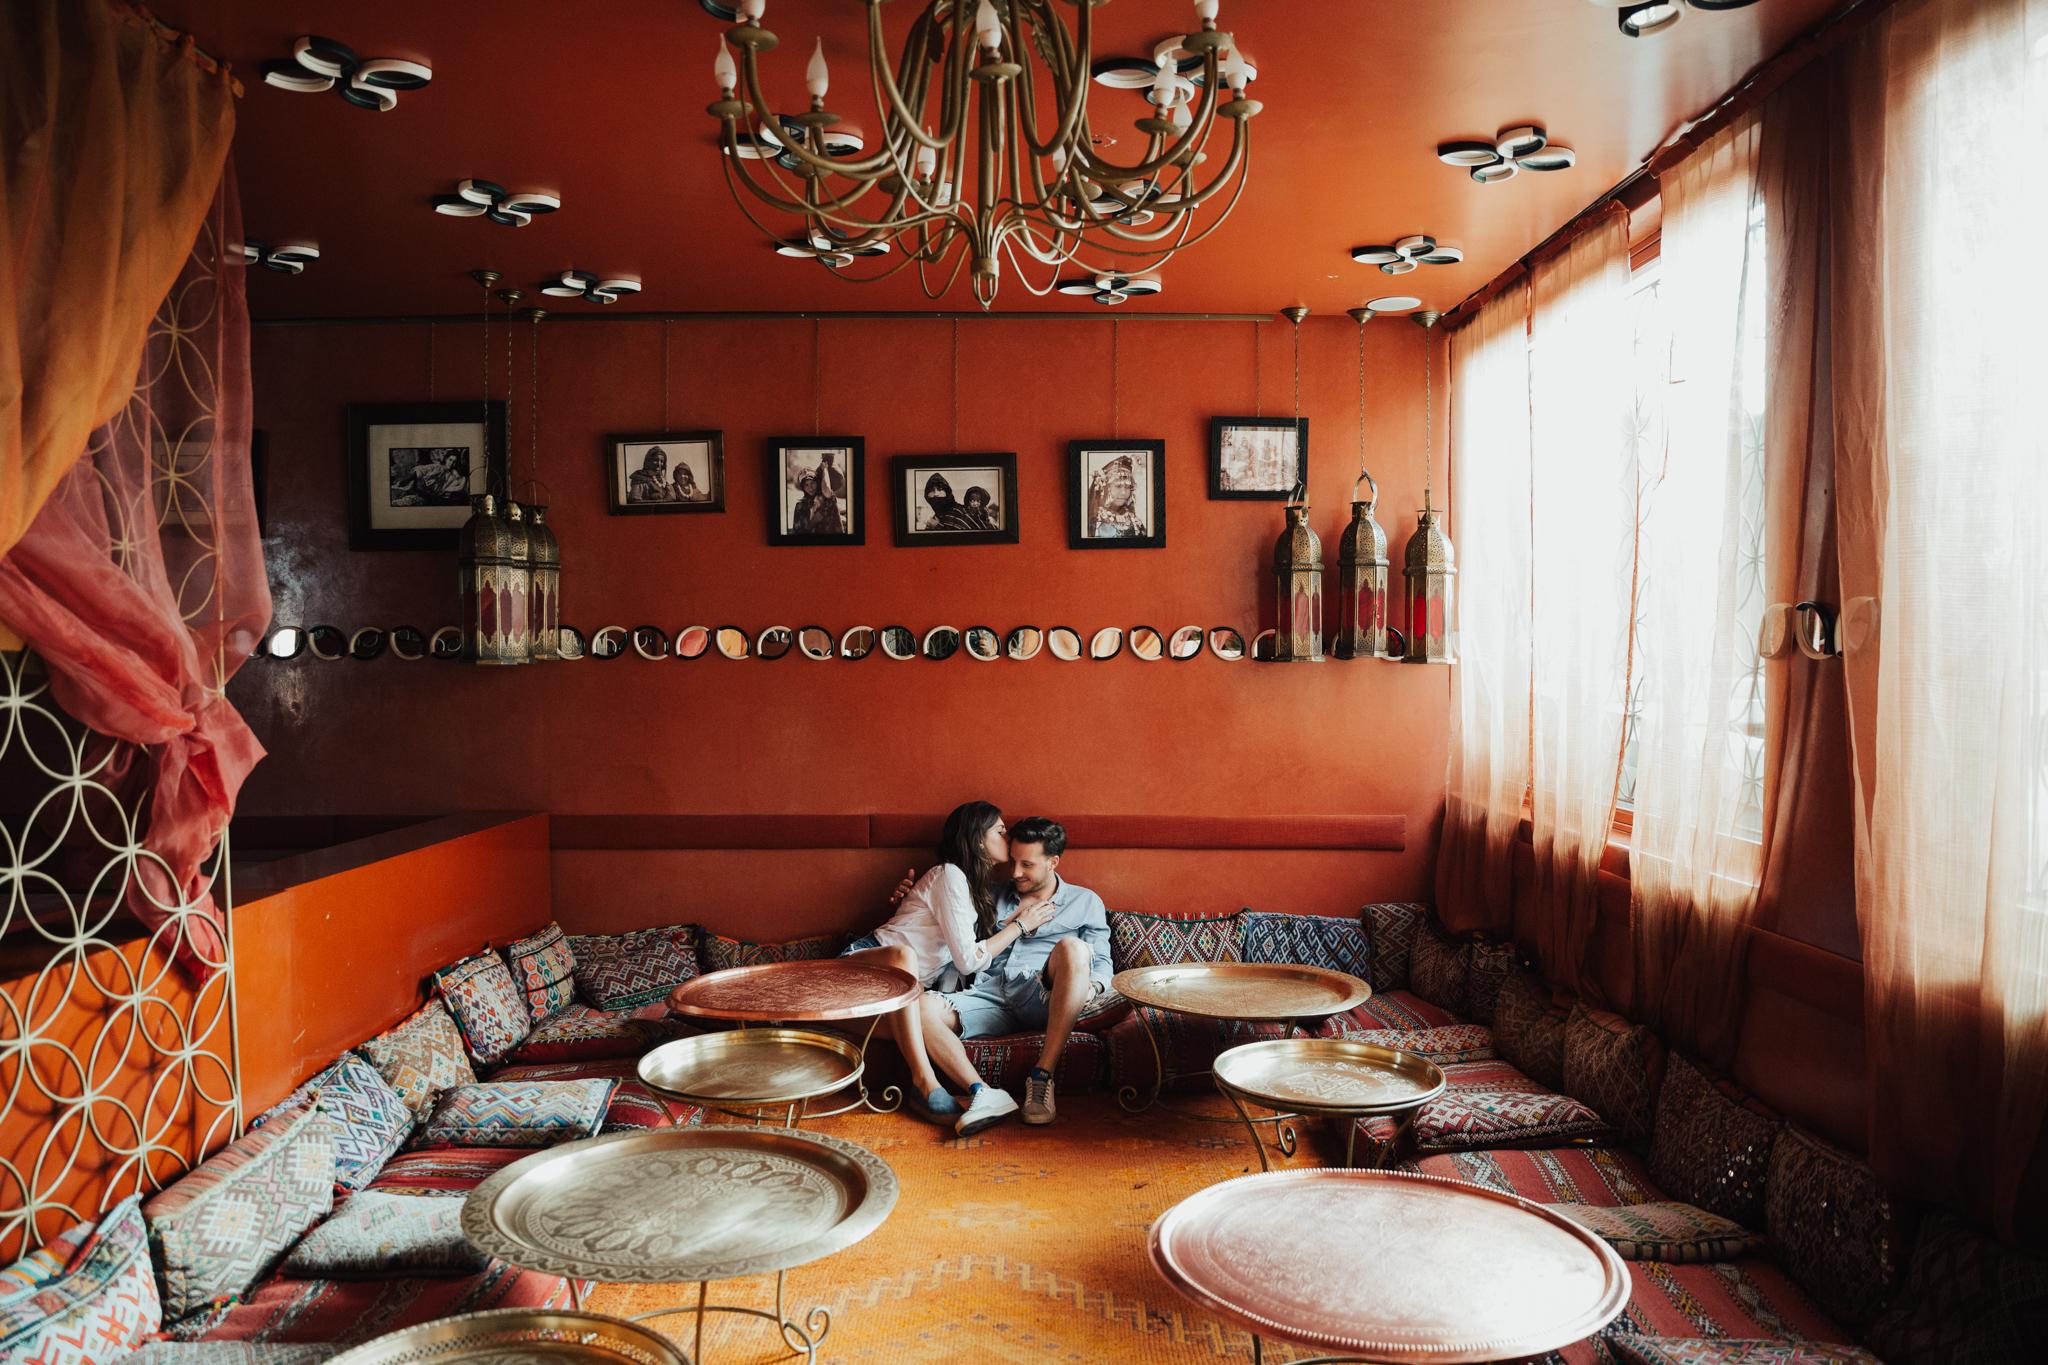 Rad Couples italy morocco spain